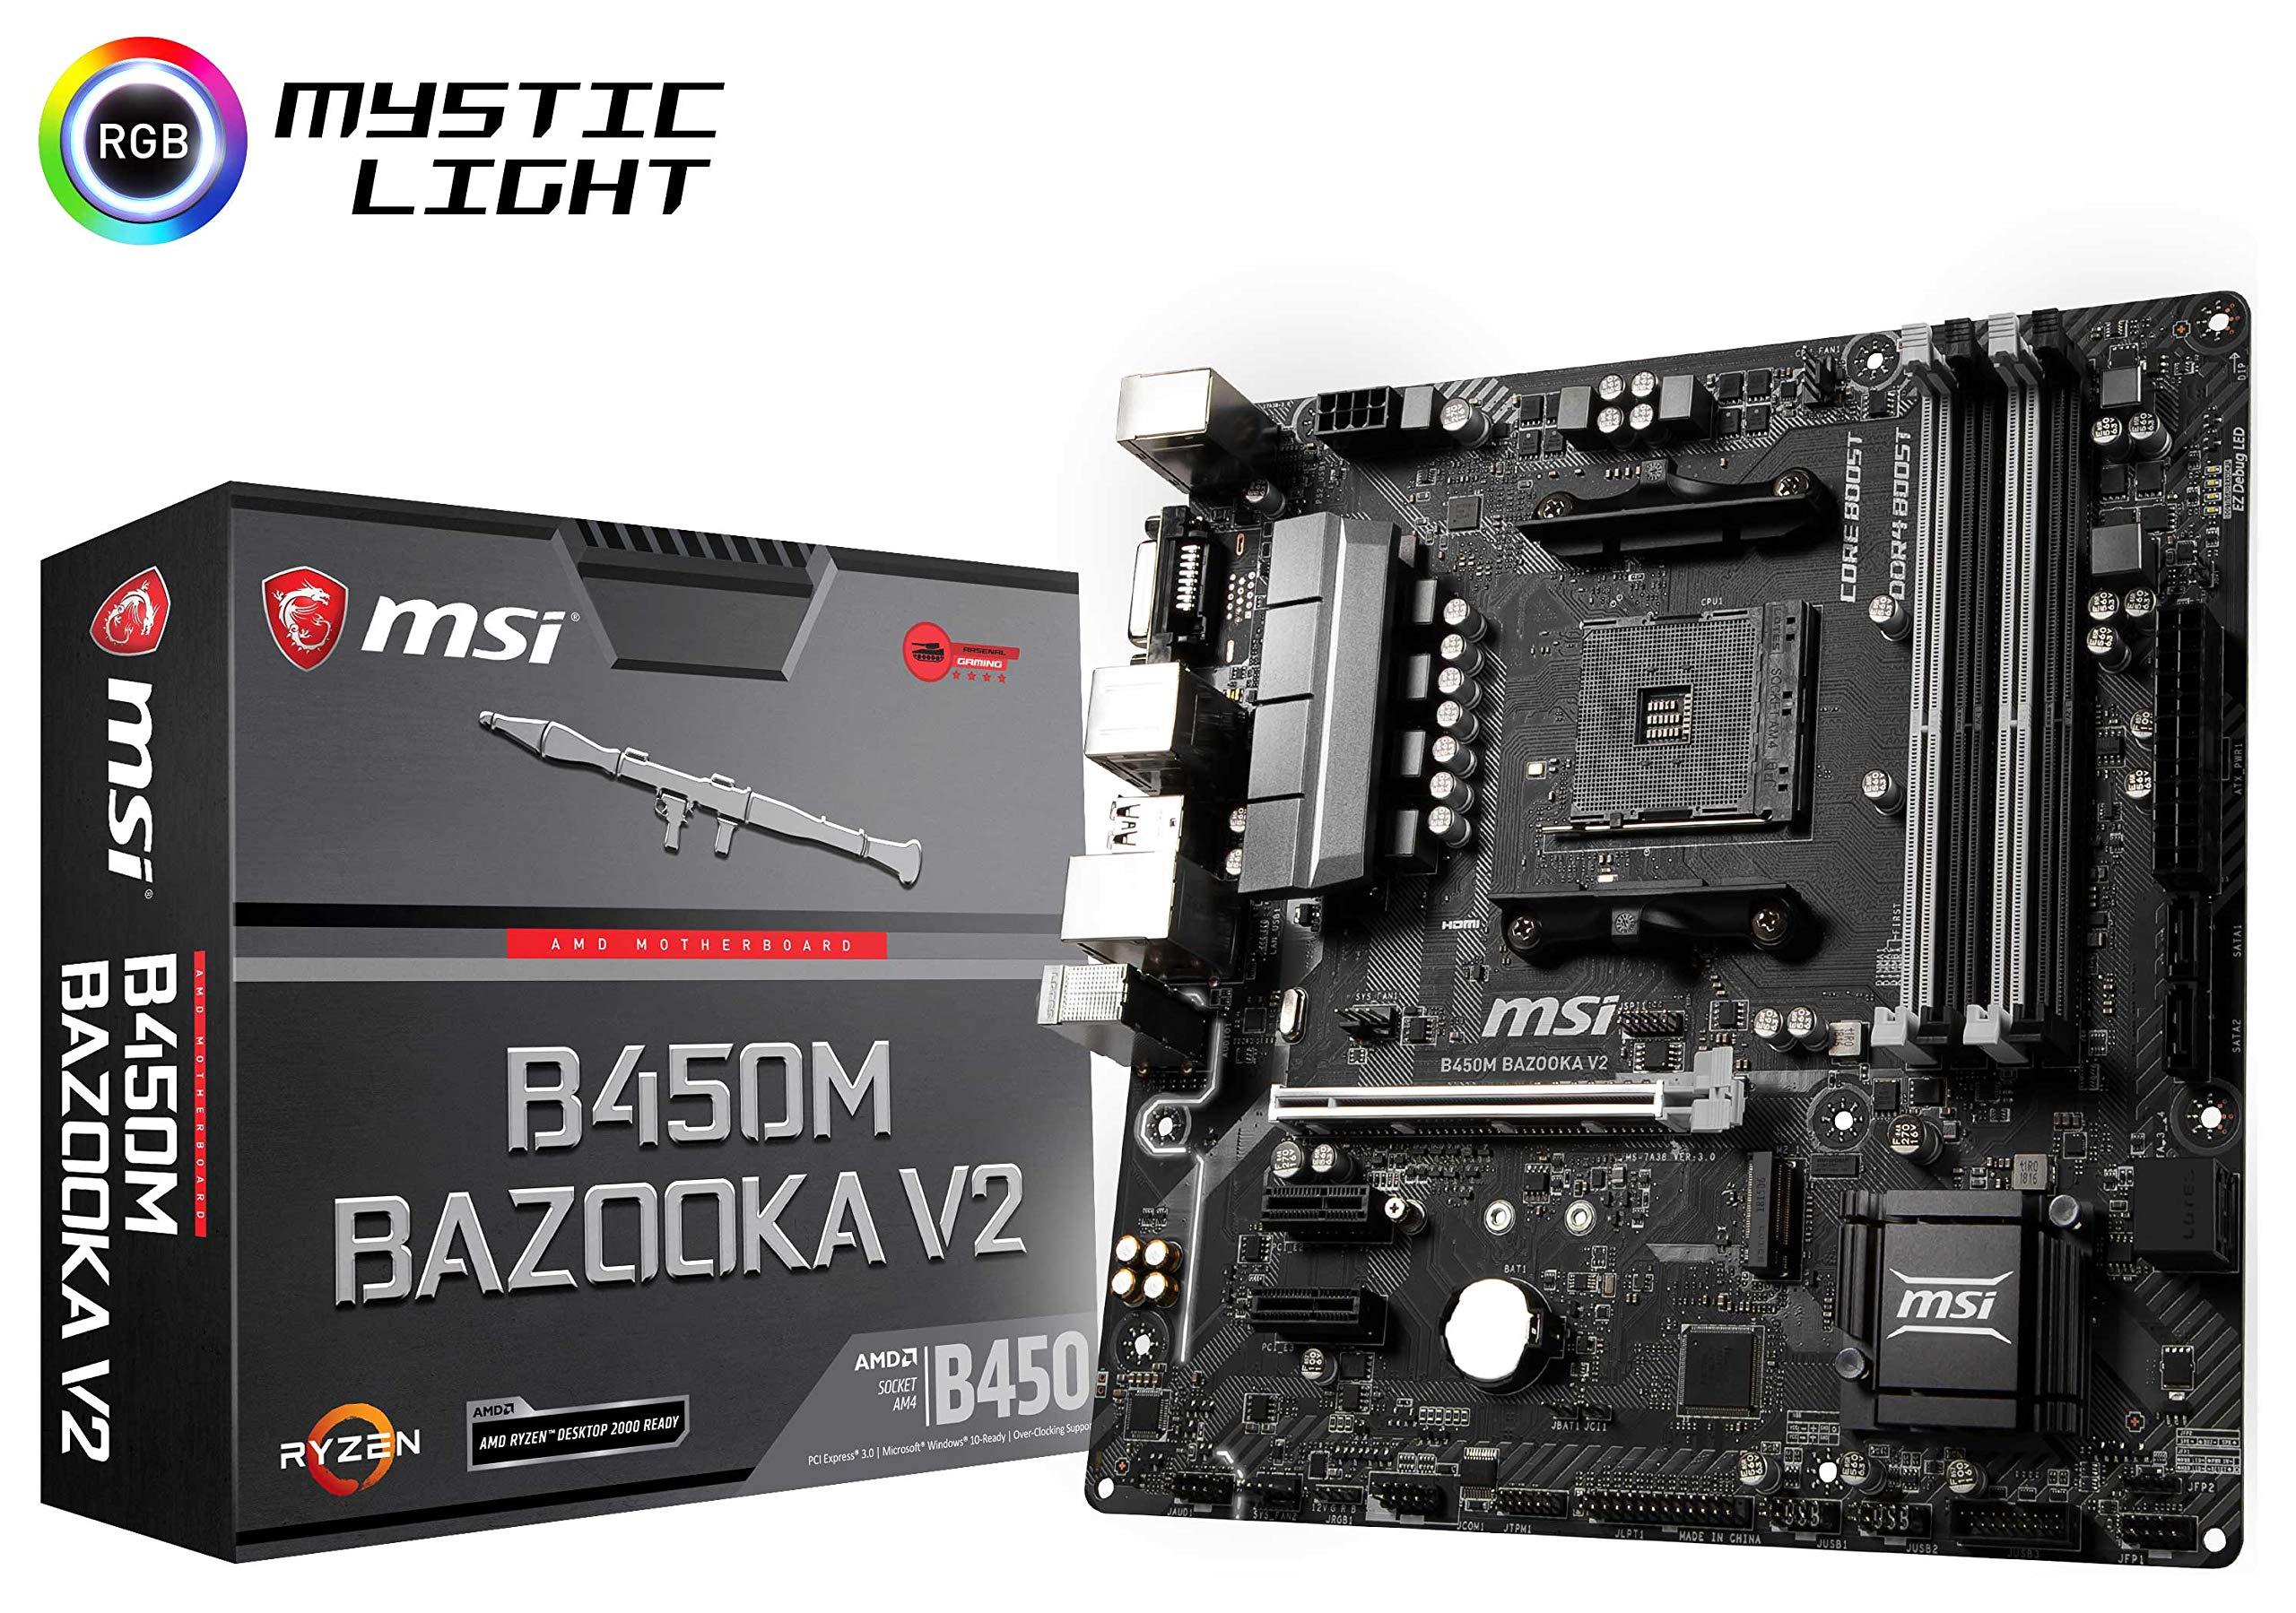 MSI Arsenal Gaming AMD Ryzen 1st and 2ND Gen AM4 M.2 USB 3 DDR4 DVI HDMI Micro-ATX Motherboard (B450M Bazooka V2)